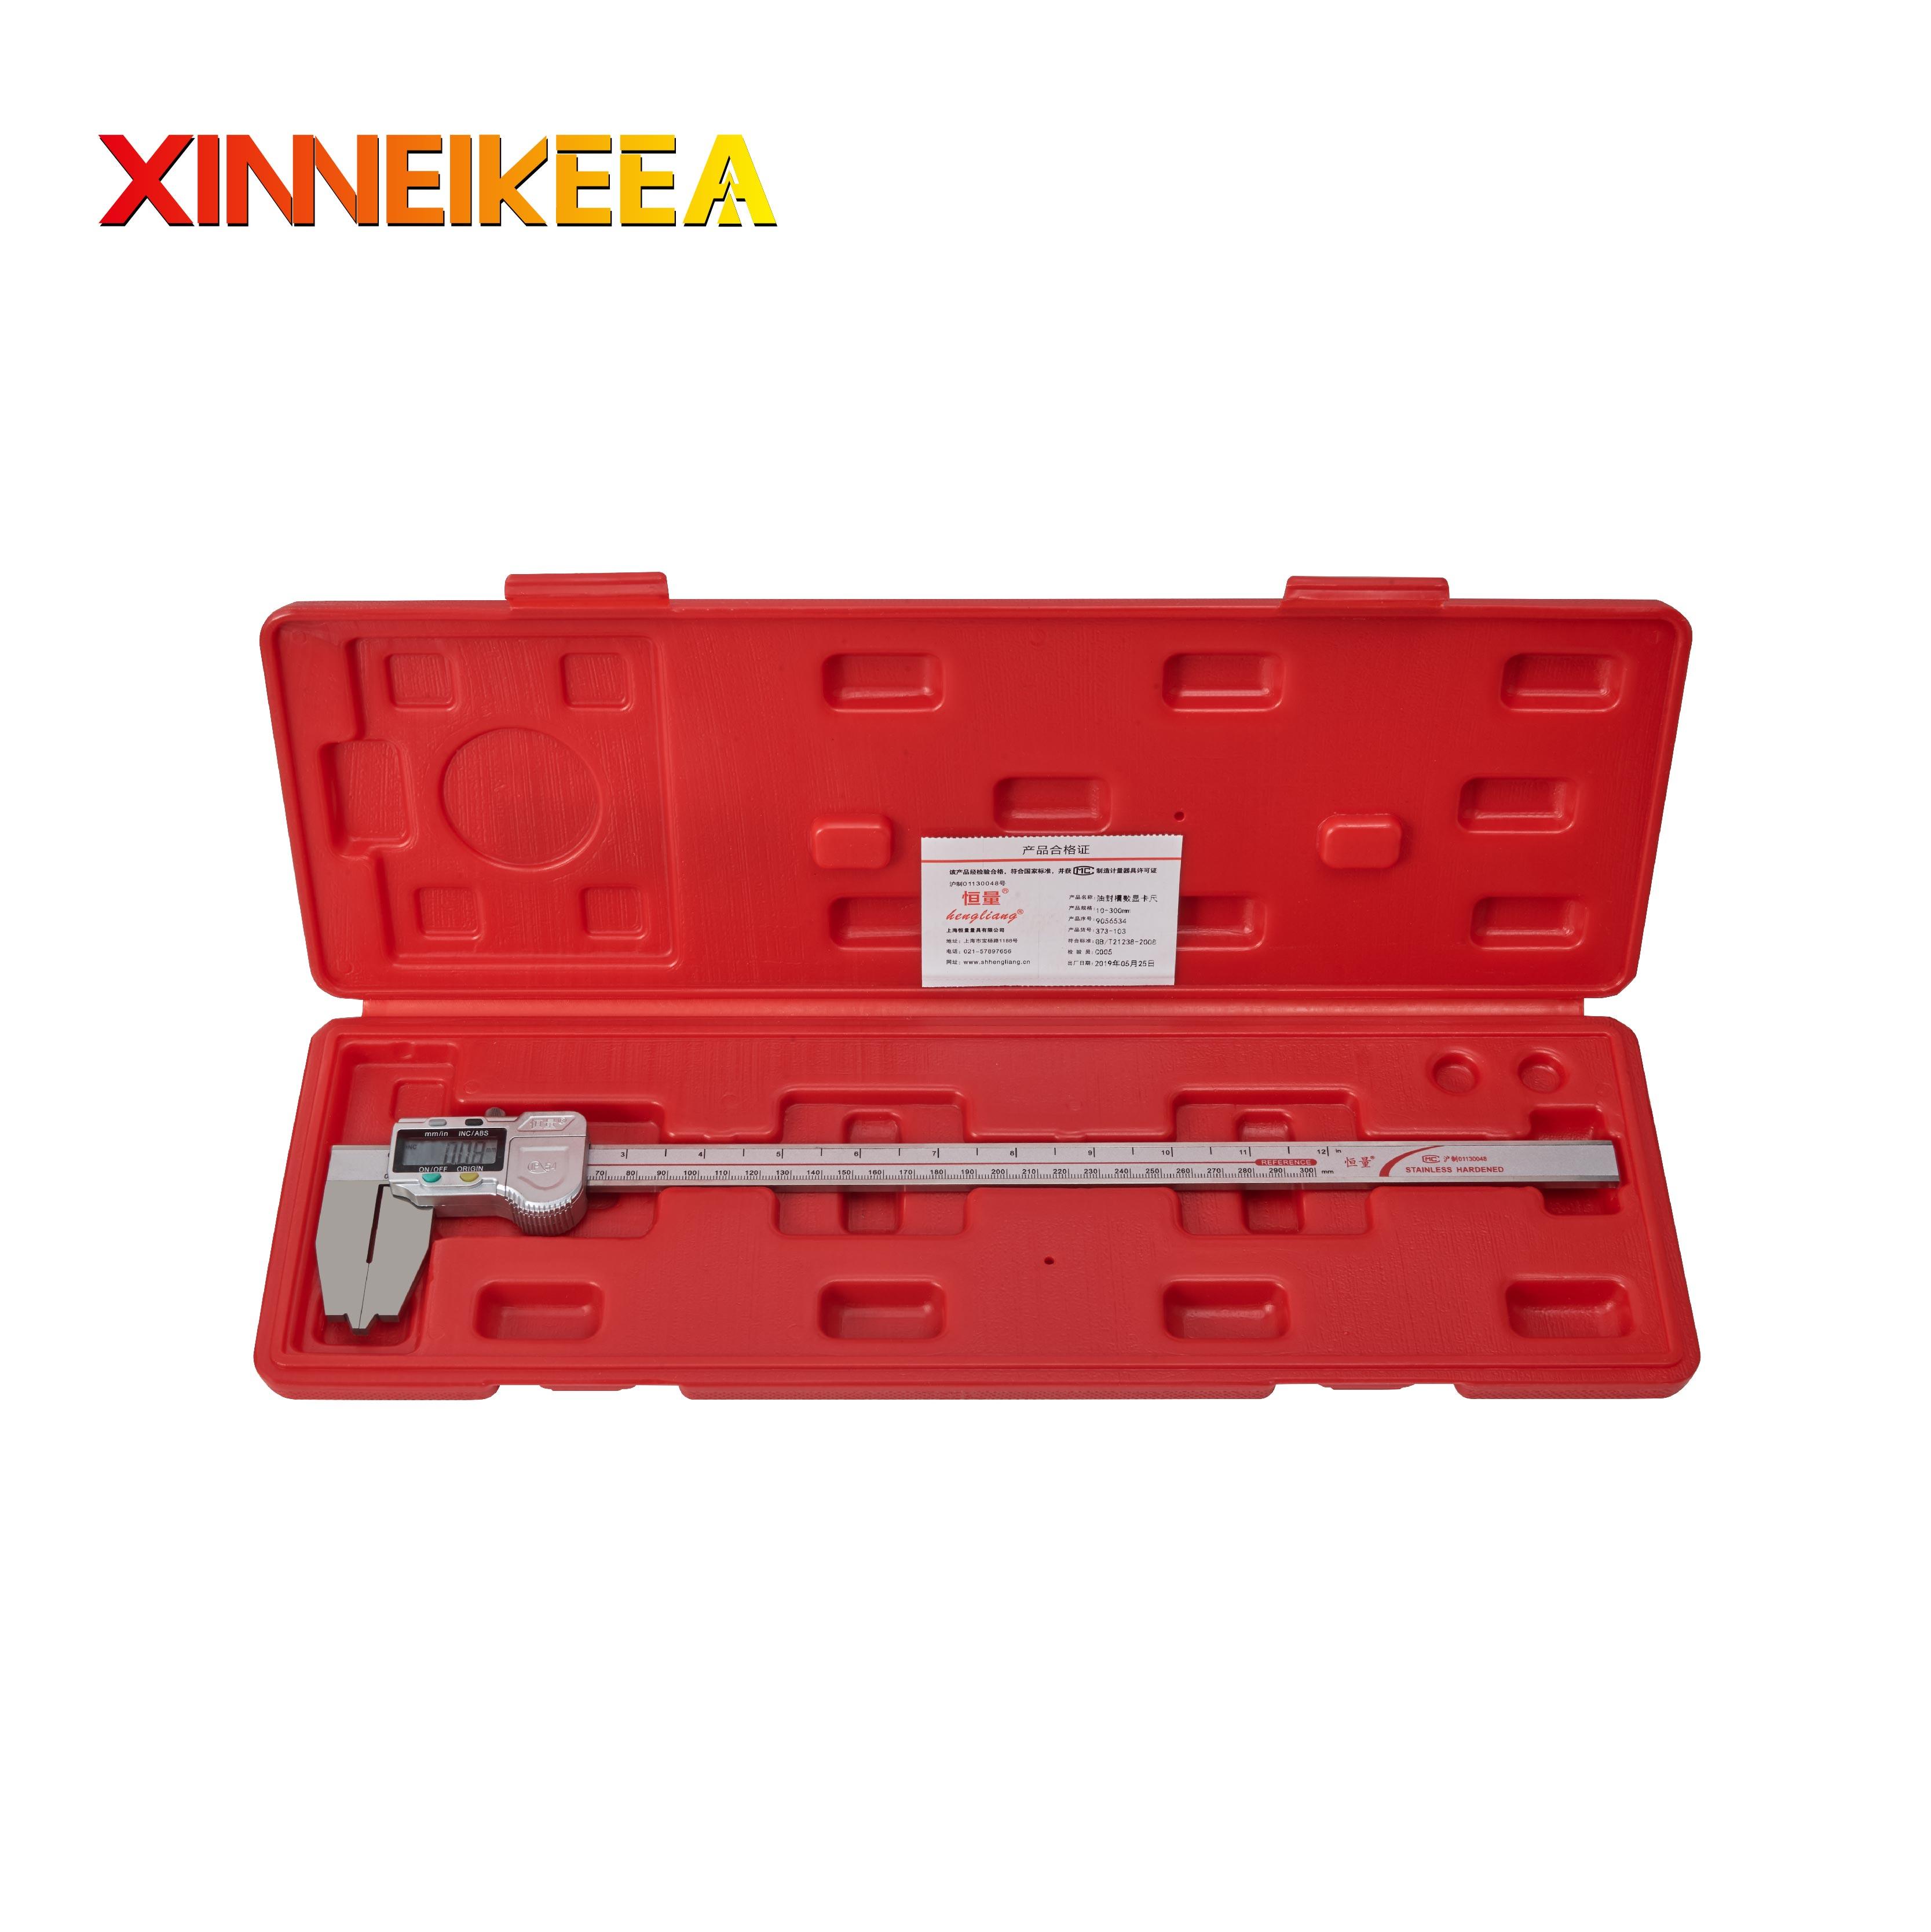 Oil Seal Groove Digital Display Caliper Stainless Steel Caliper Digital Display Caliper Measuring Tool 0-300mm 0-500mm Calipers